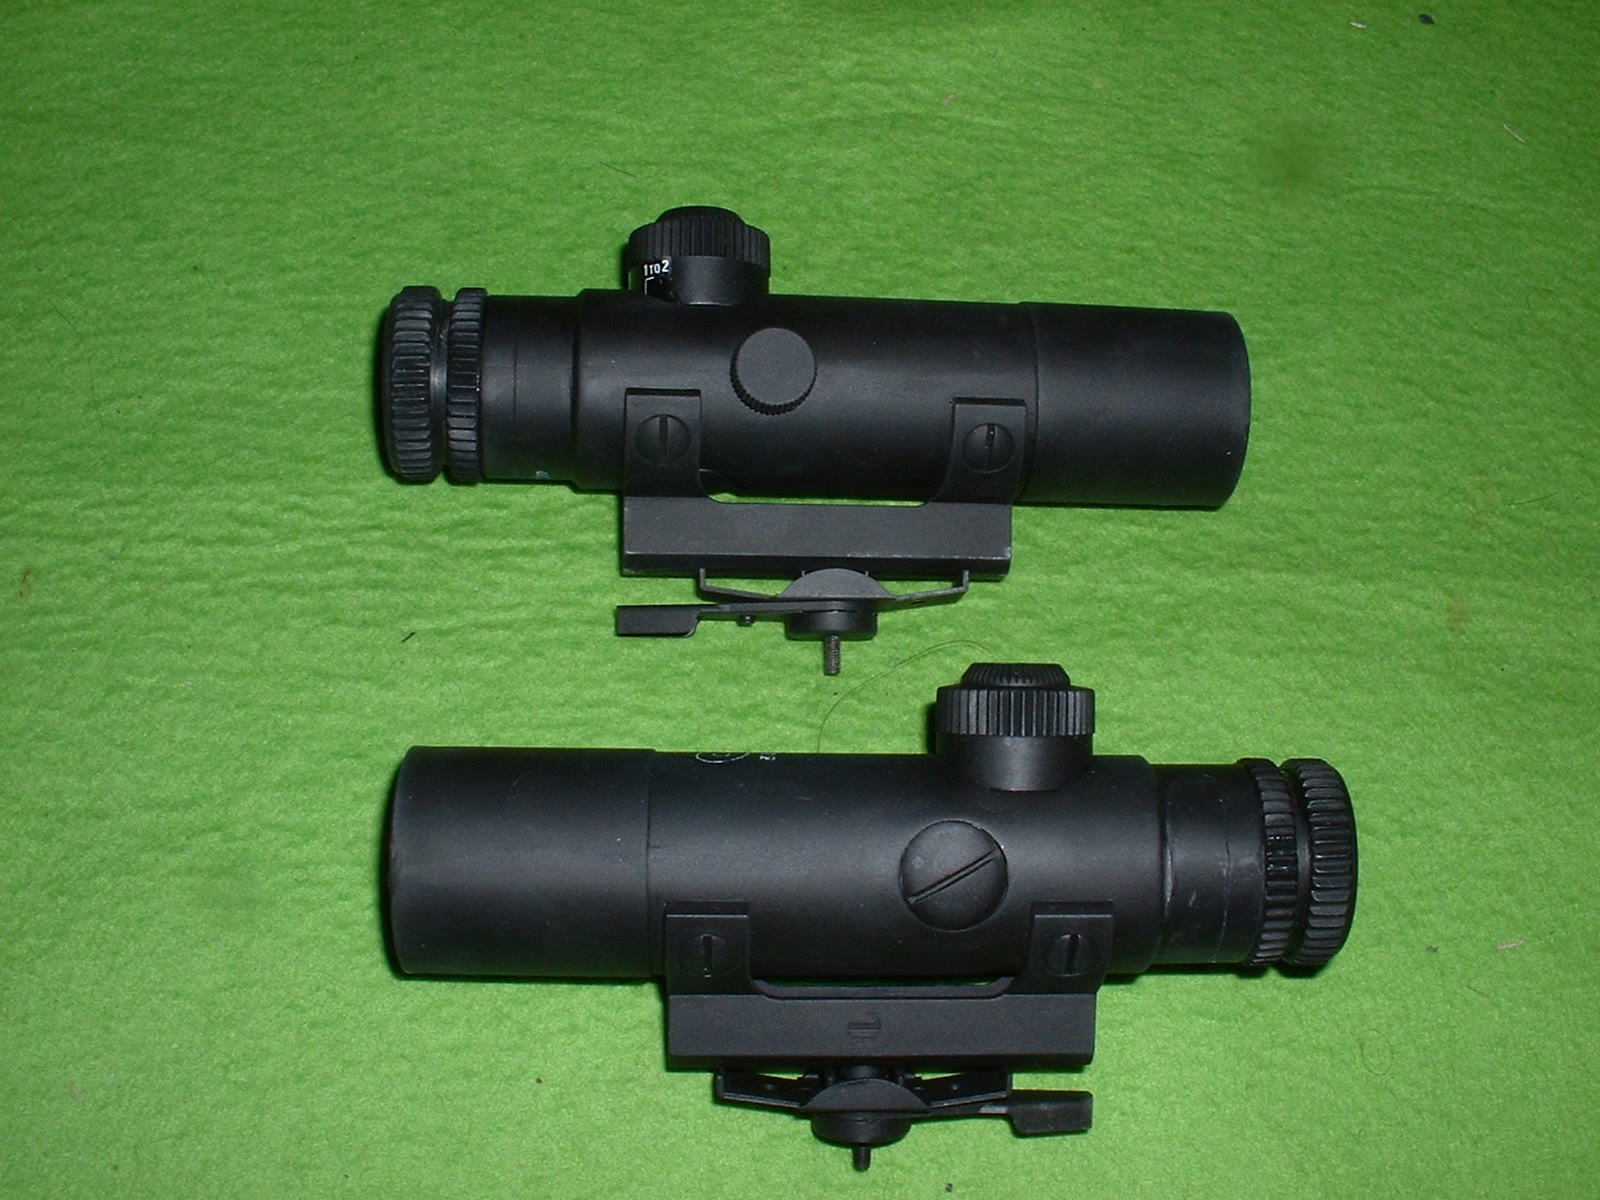 LS(現マイクロエース) M16用スコープ Doburoku-TAO.JPG